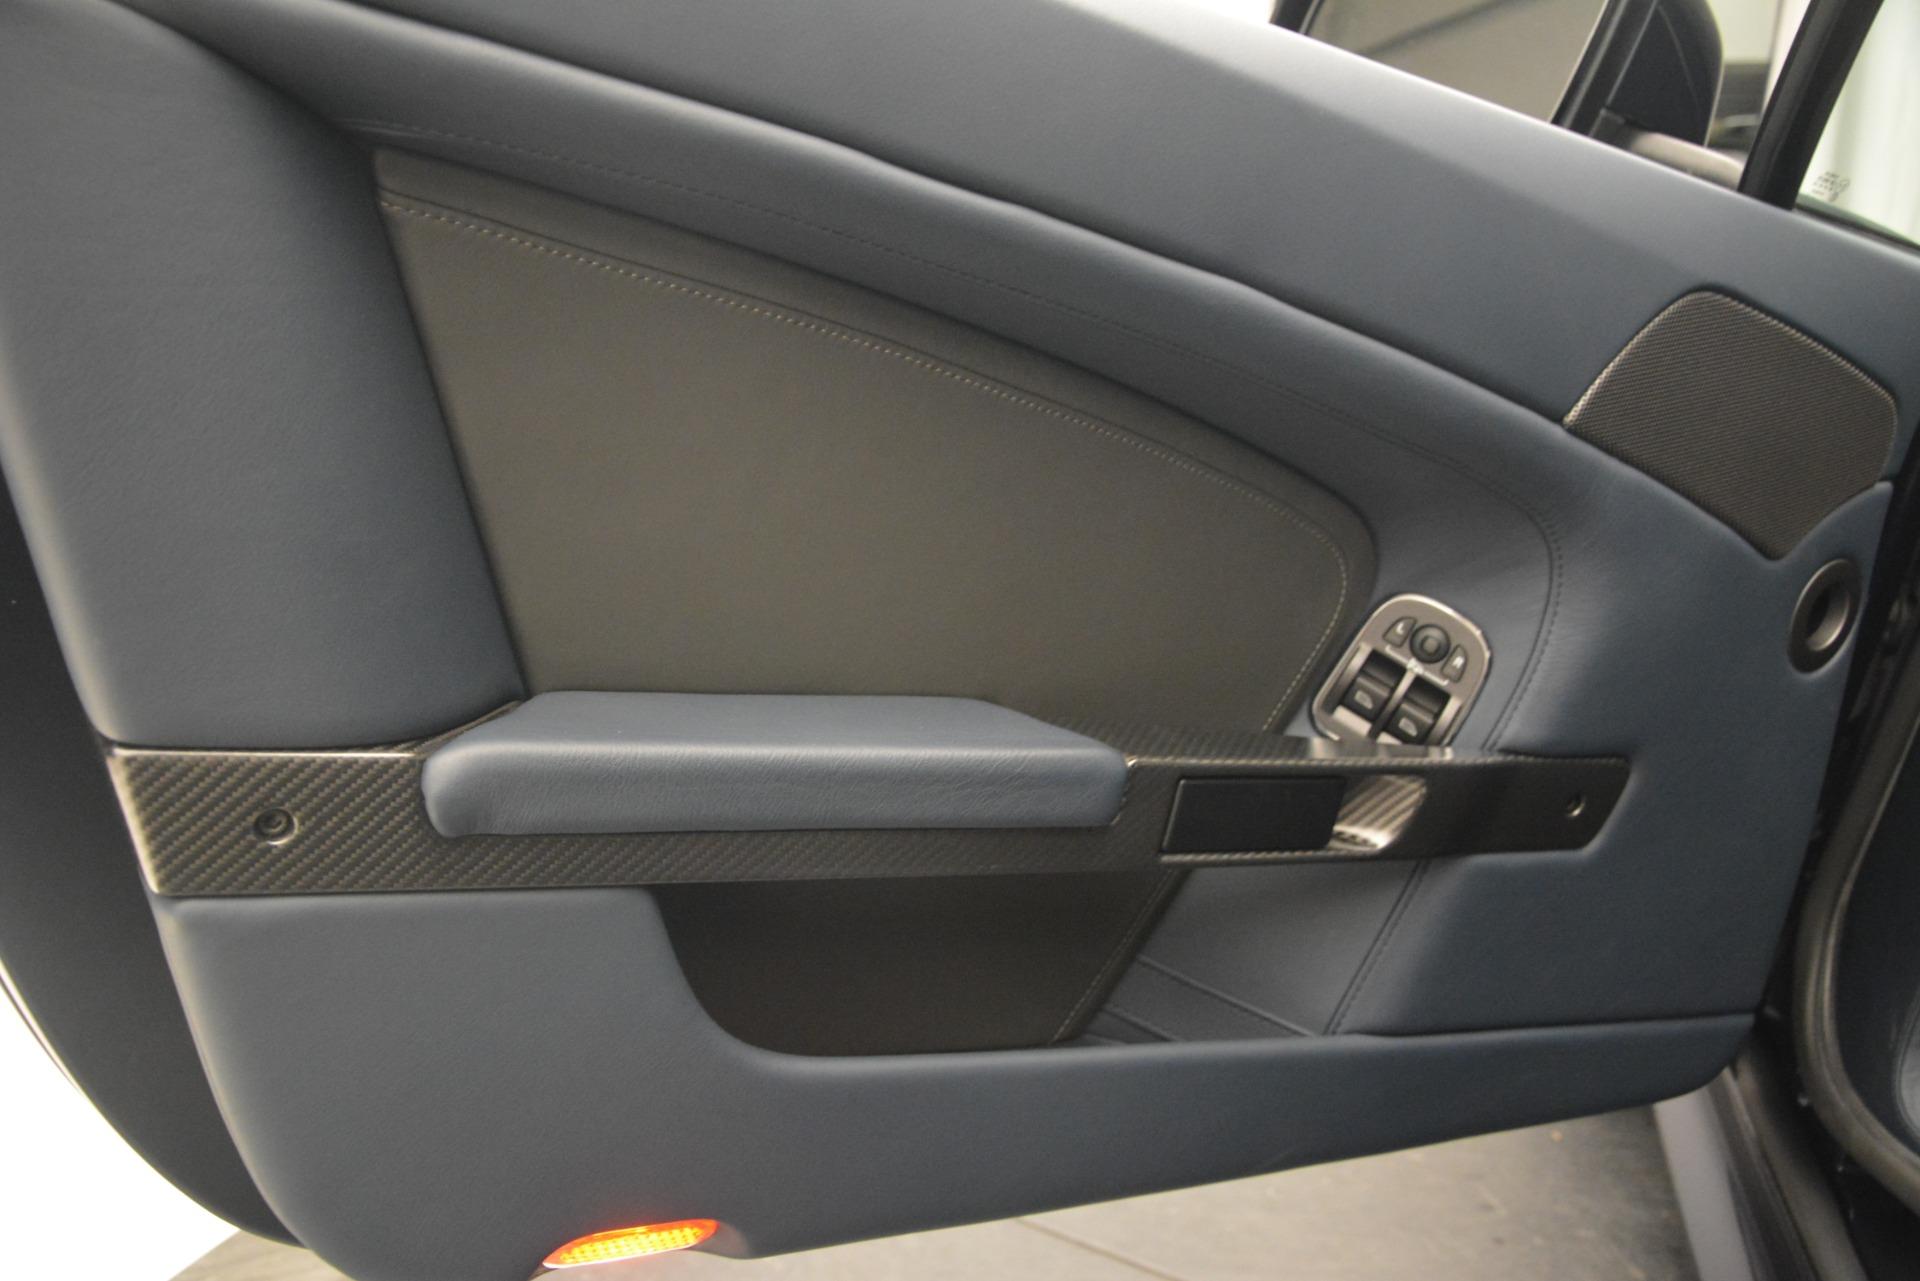 Used 2012 Aston Martin V12 Vantage  For Sale In Greenwich, CT 3046_p17